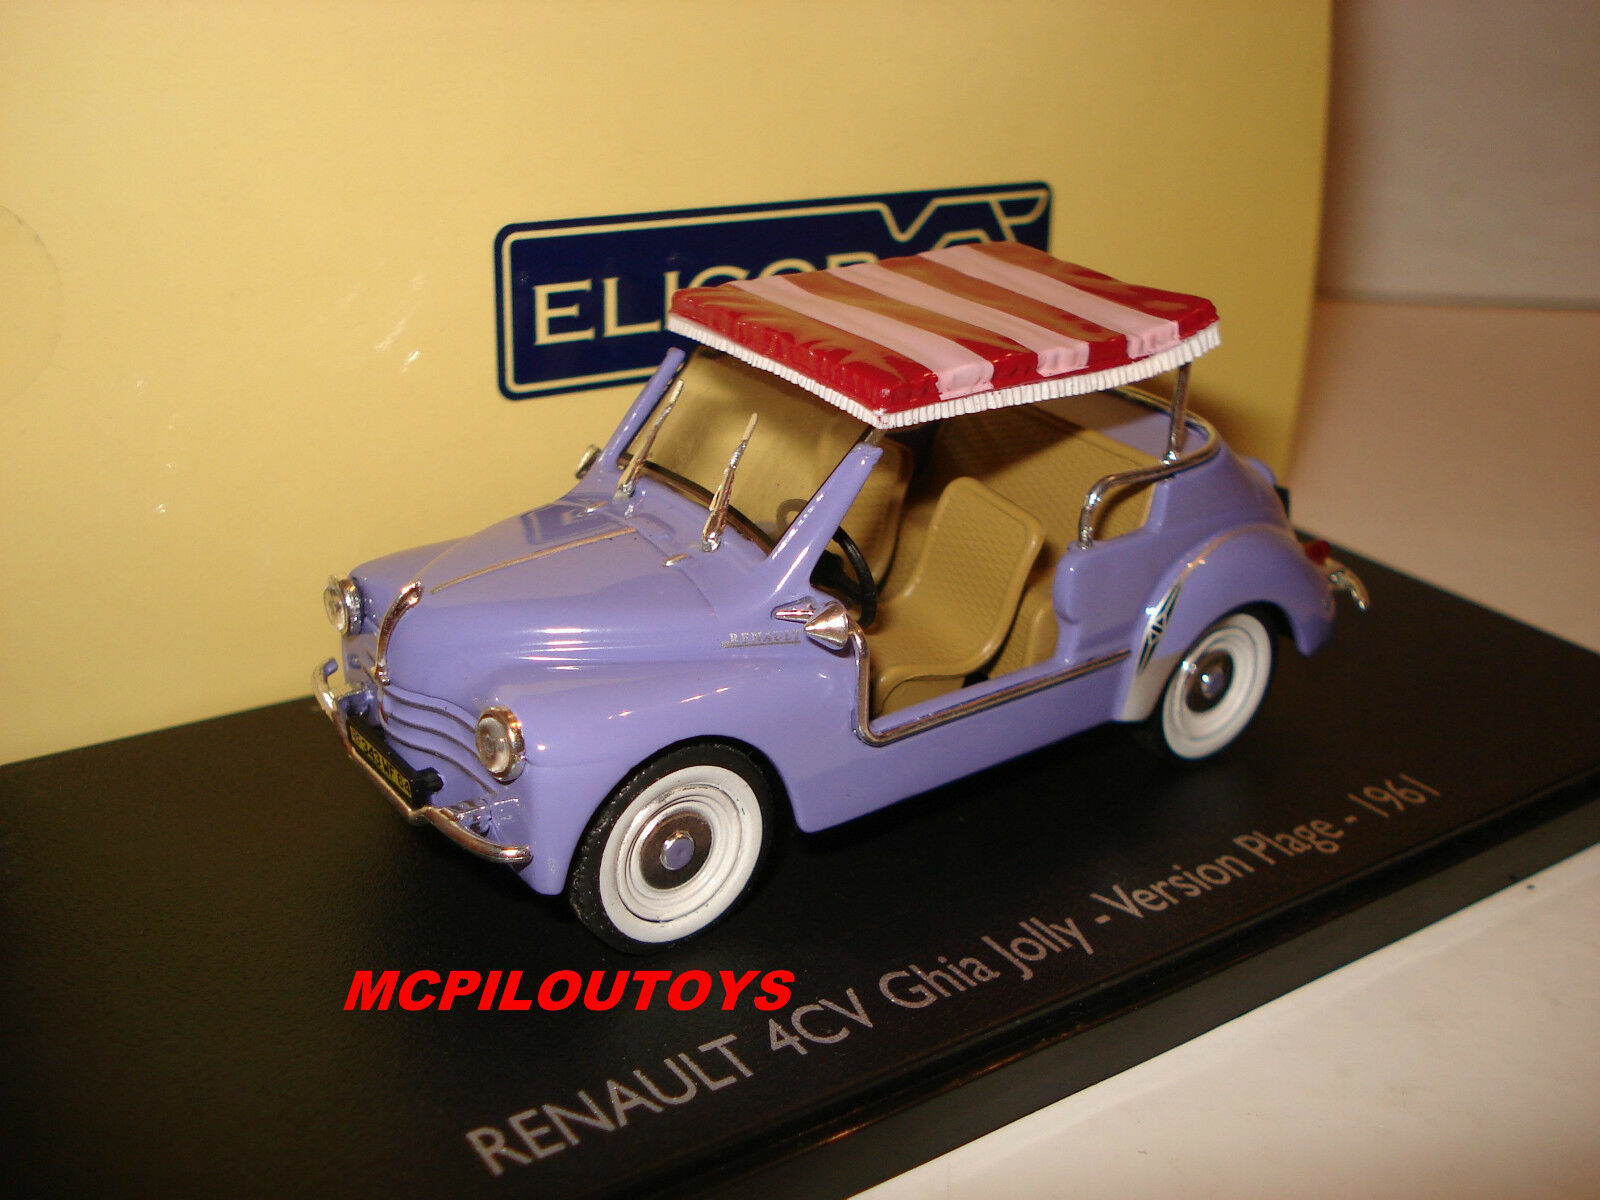 Eligor renault 4CV Ghia Ghia Ghia JOLLY Version Strand 1961 au 1 43° 317203